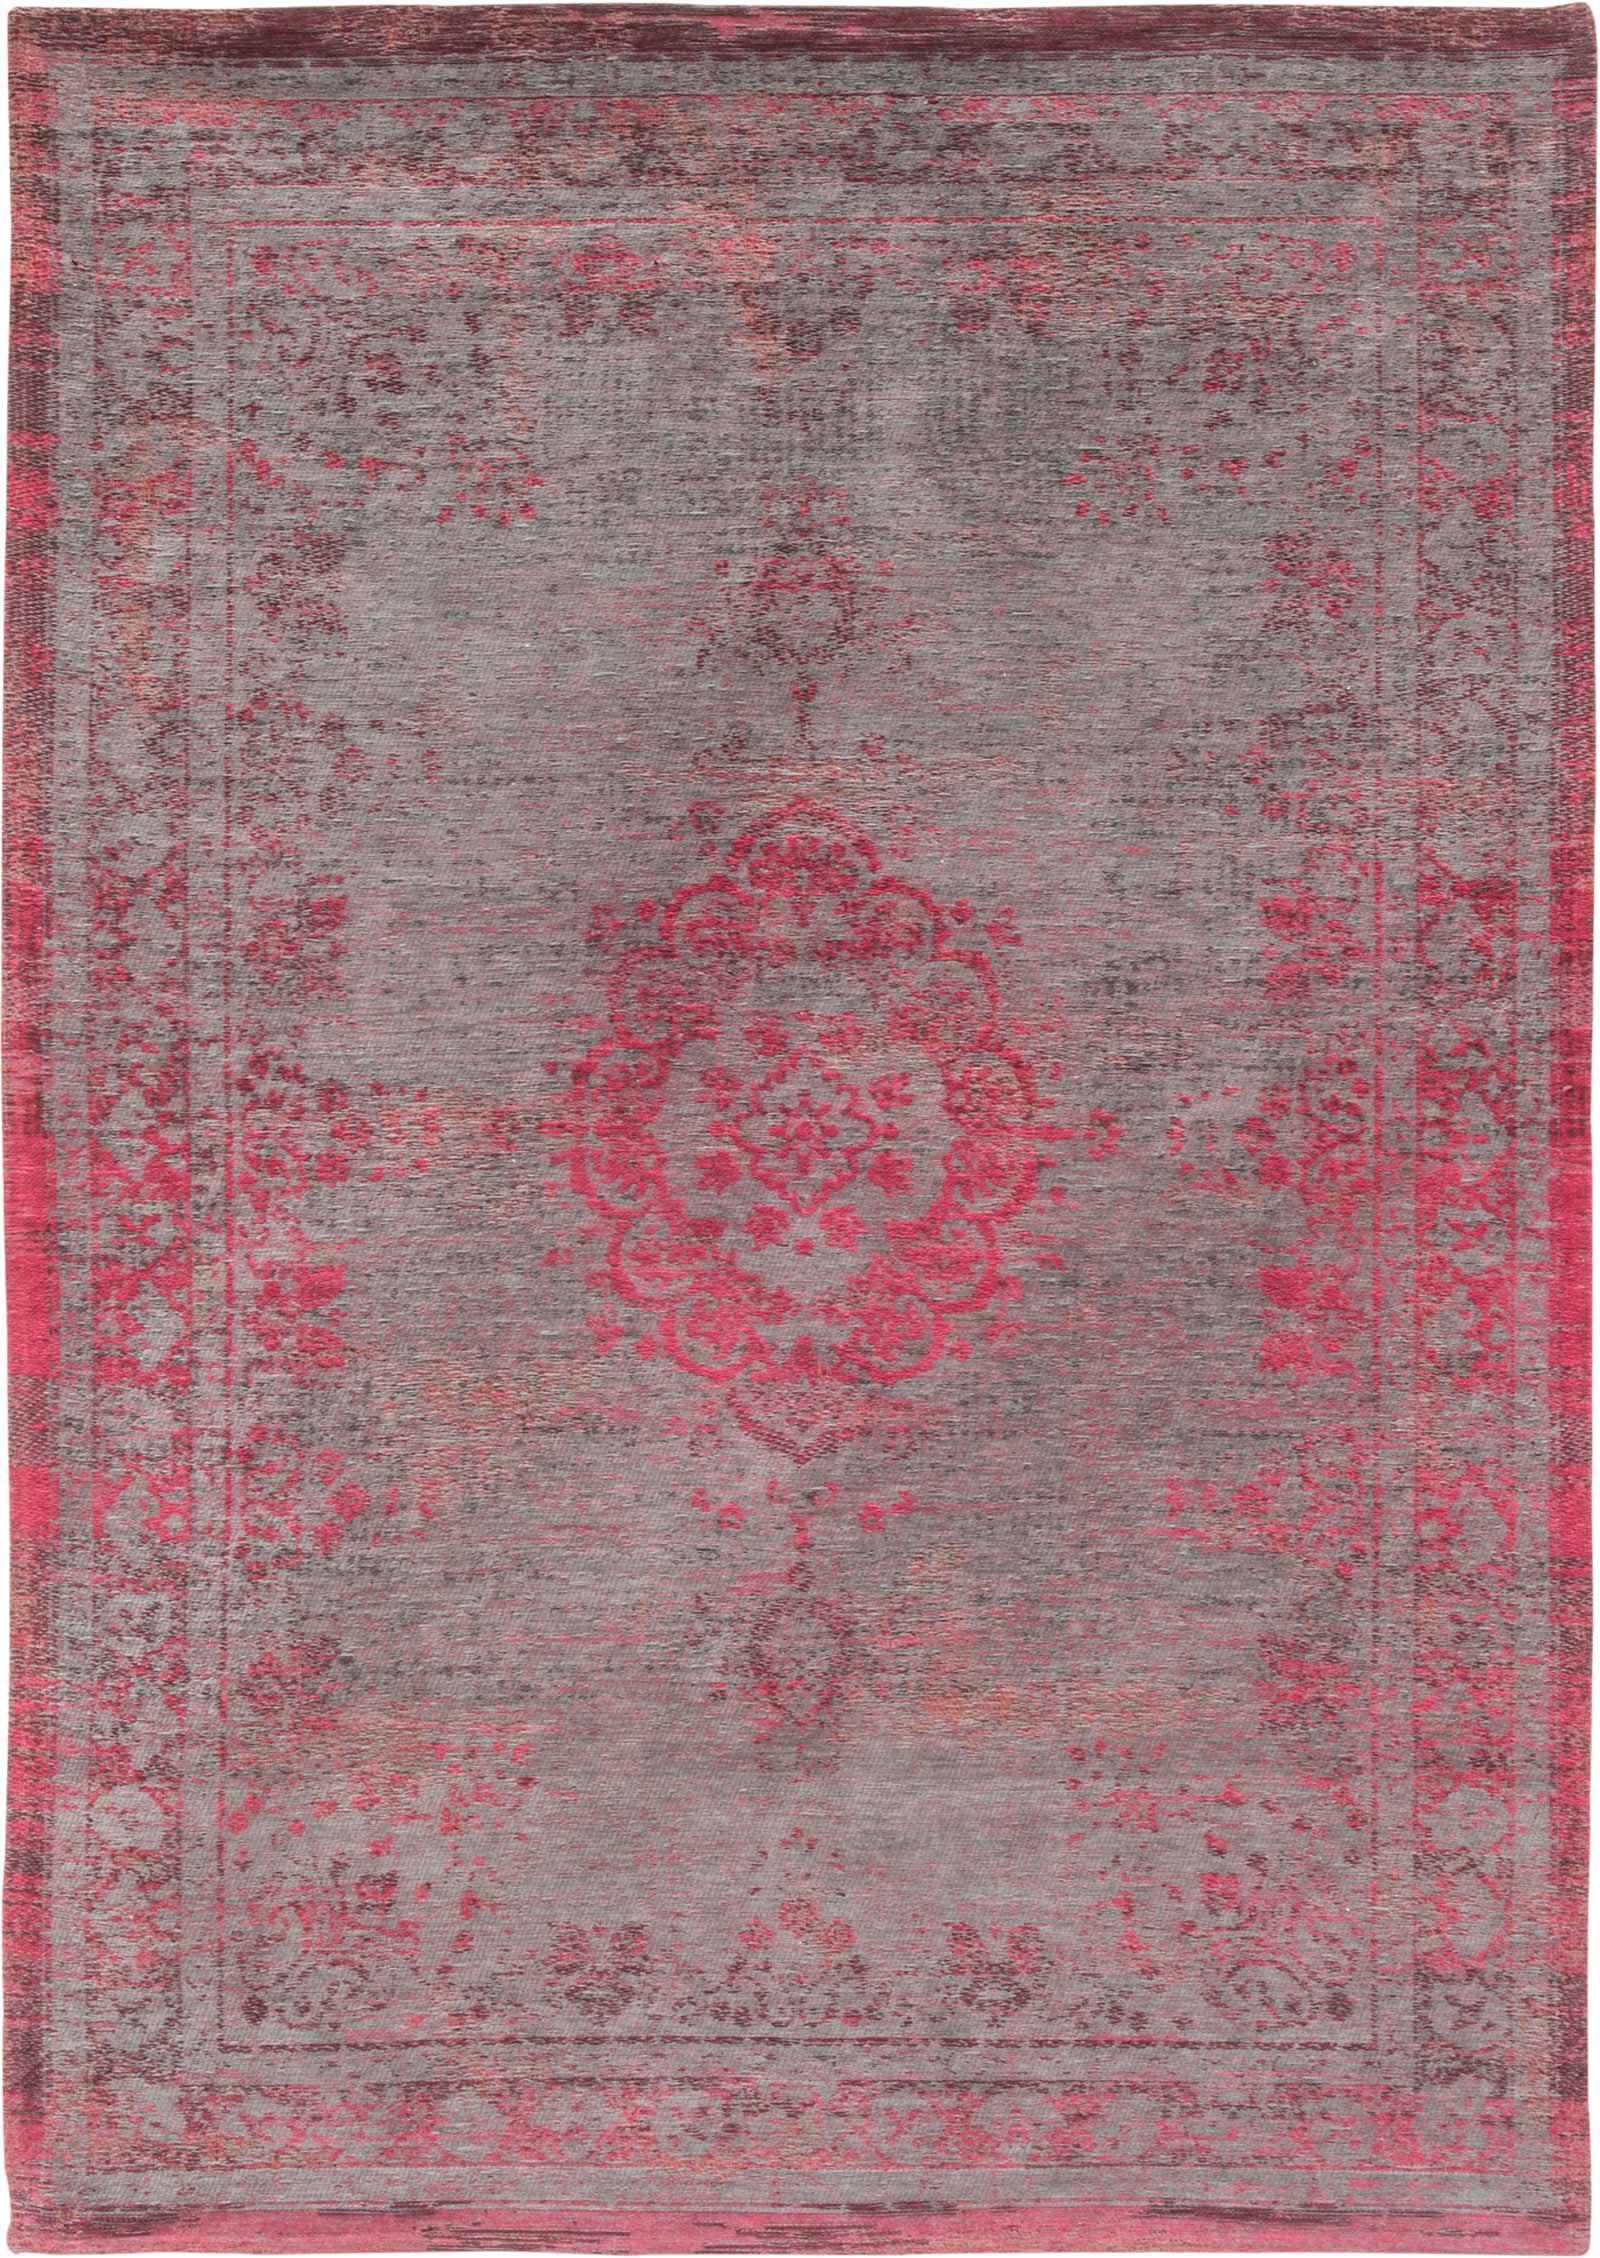 rug Louis De Poortere LX8261 Fading World Medaillon Pink Flash